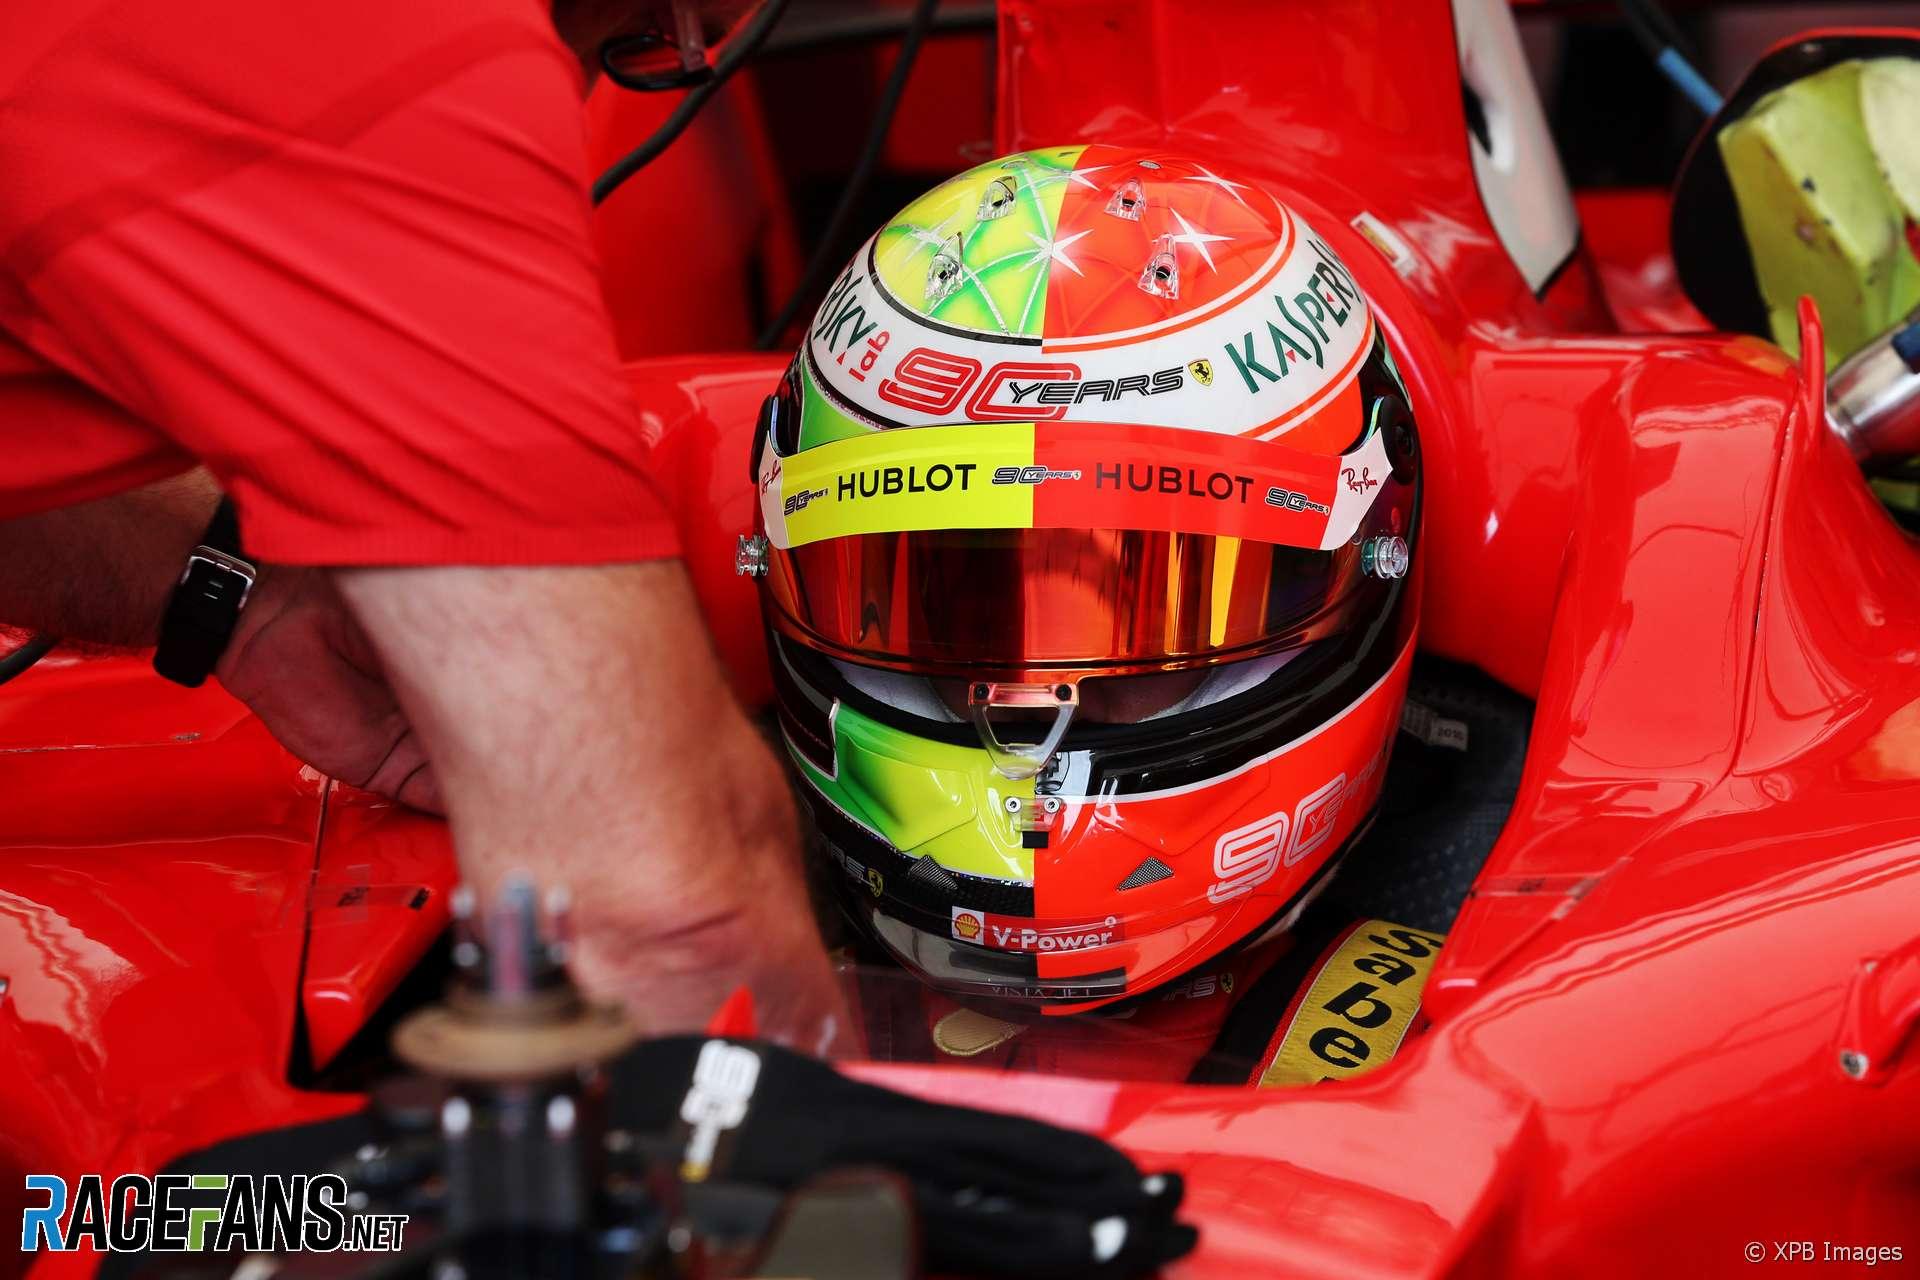 Mick Schumacher Ferrari F2004 Hockenheimring 2019 Racefans